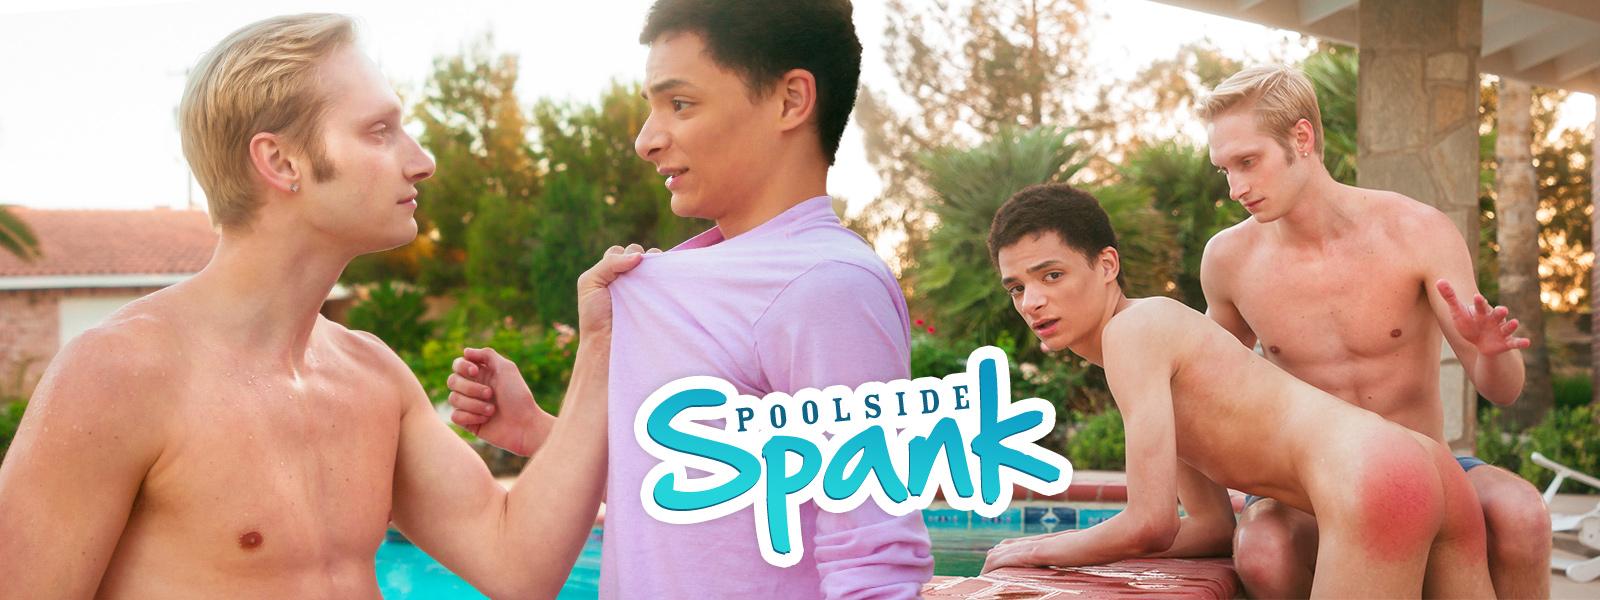 Poolside Spank